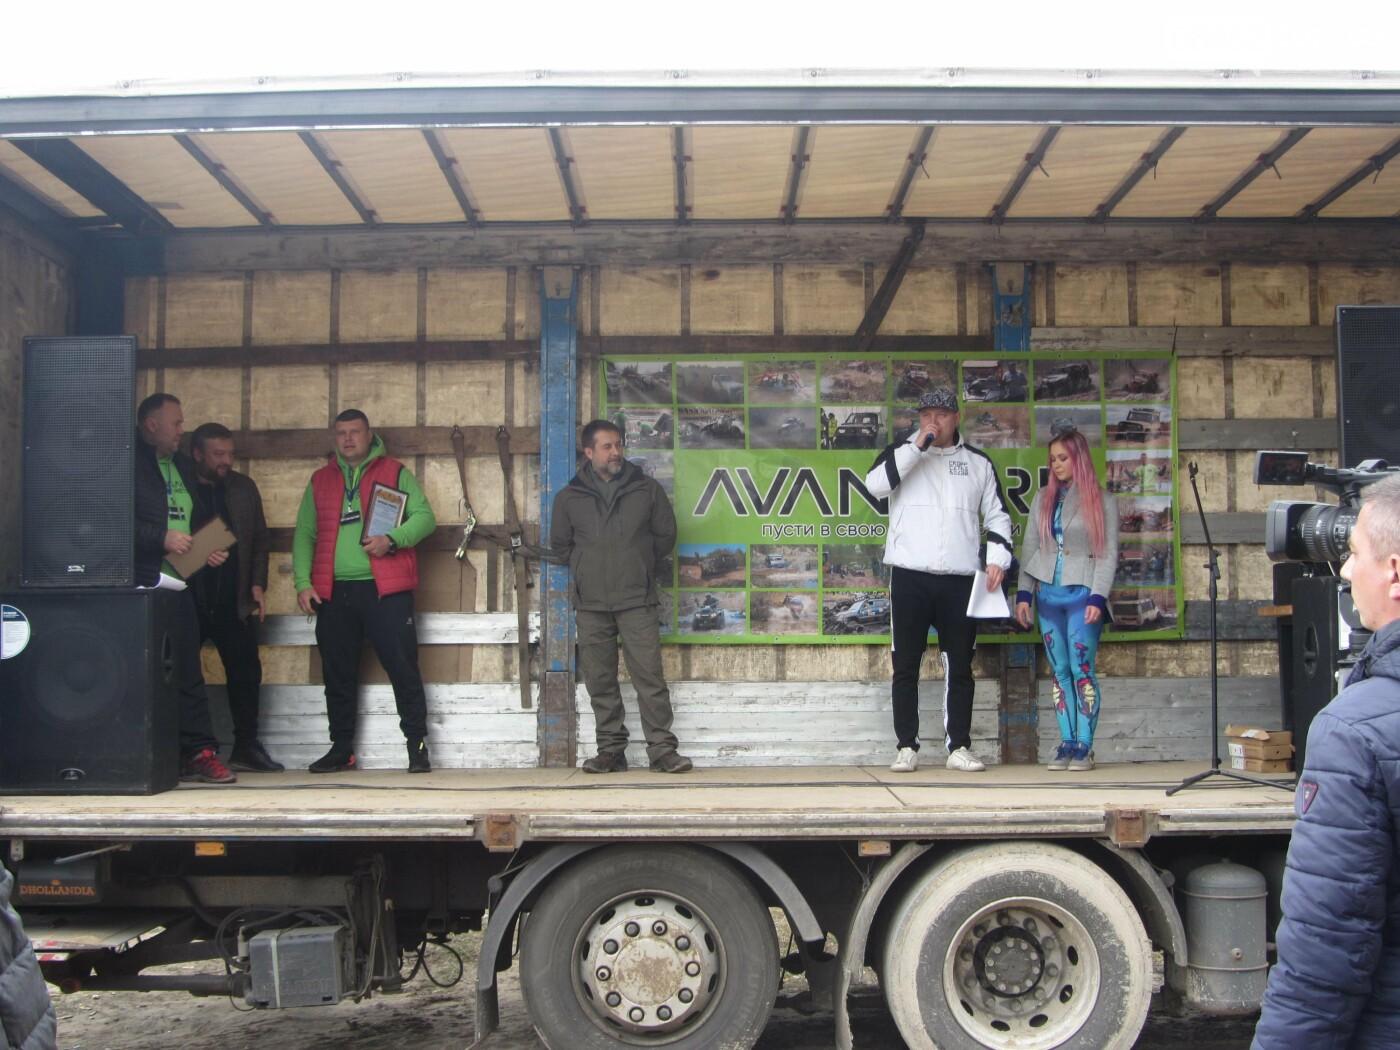 MUD RACE: захватывающая борьба техники с северодонецким бездорожьем (фото, видео), фото-1